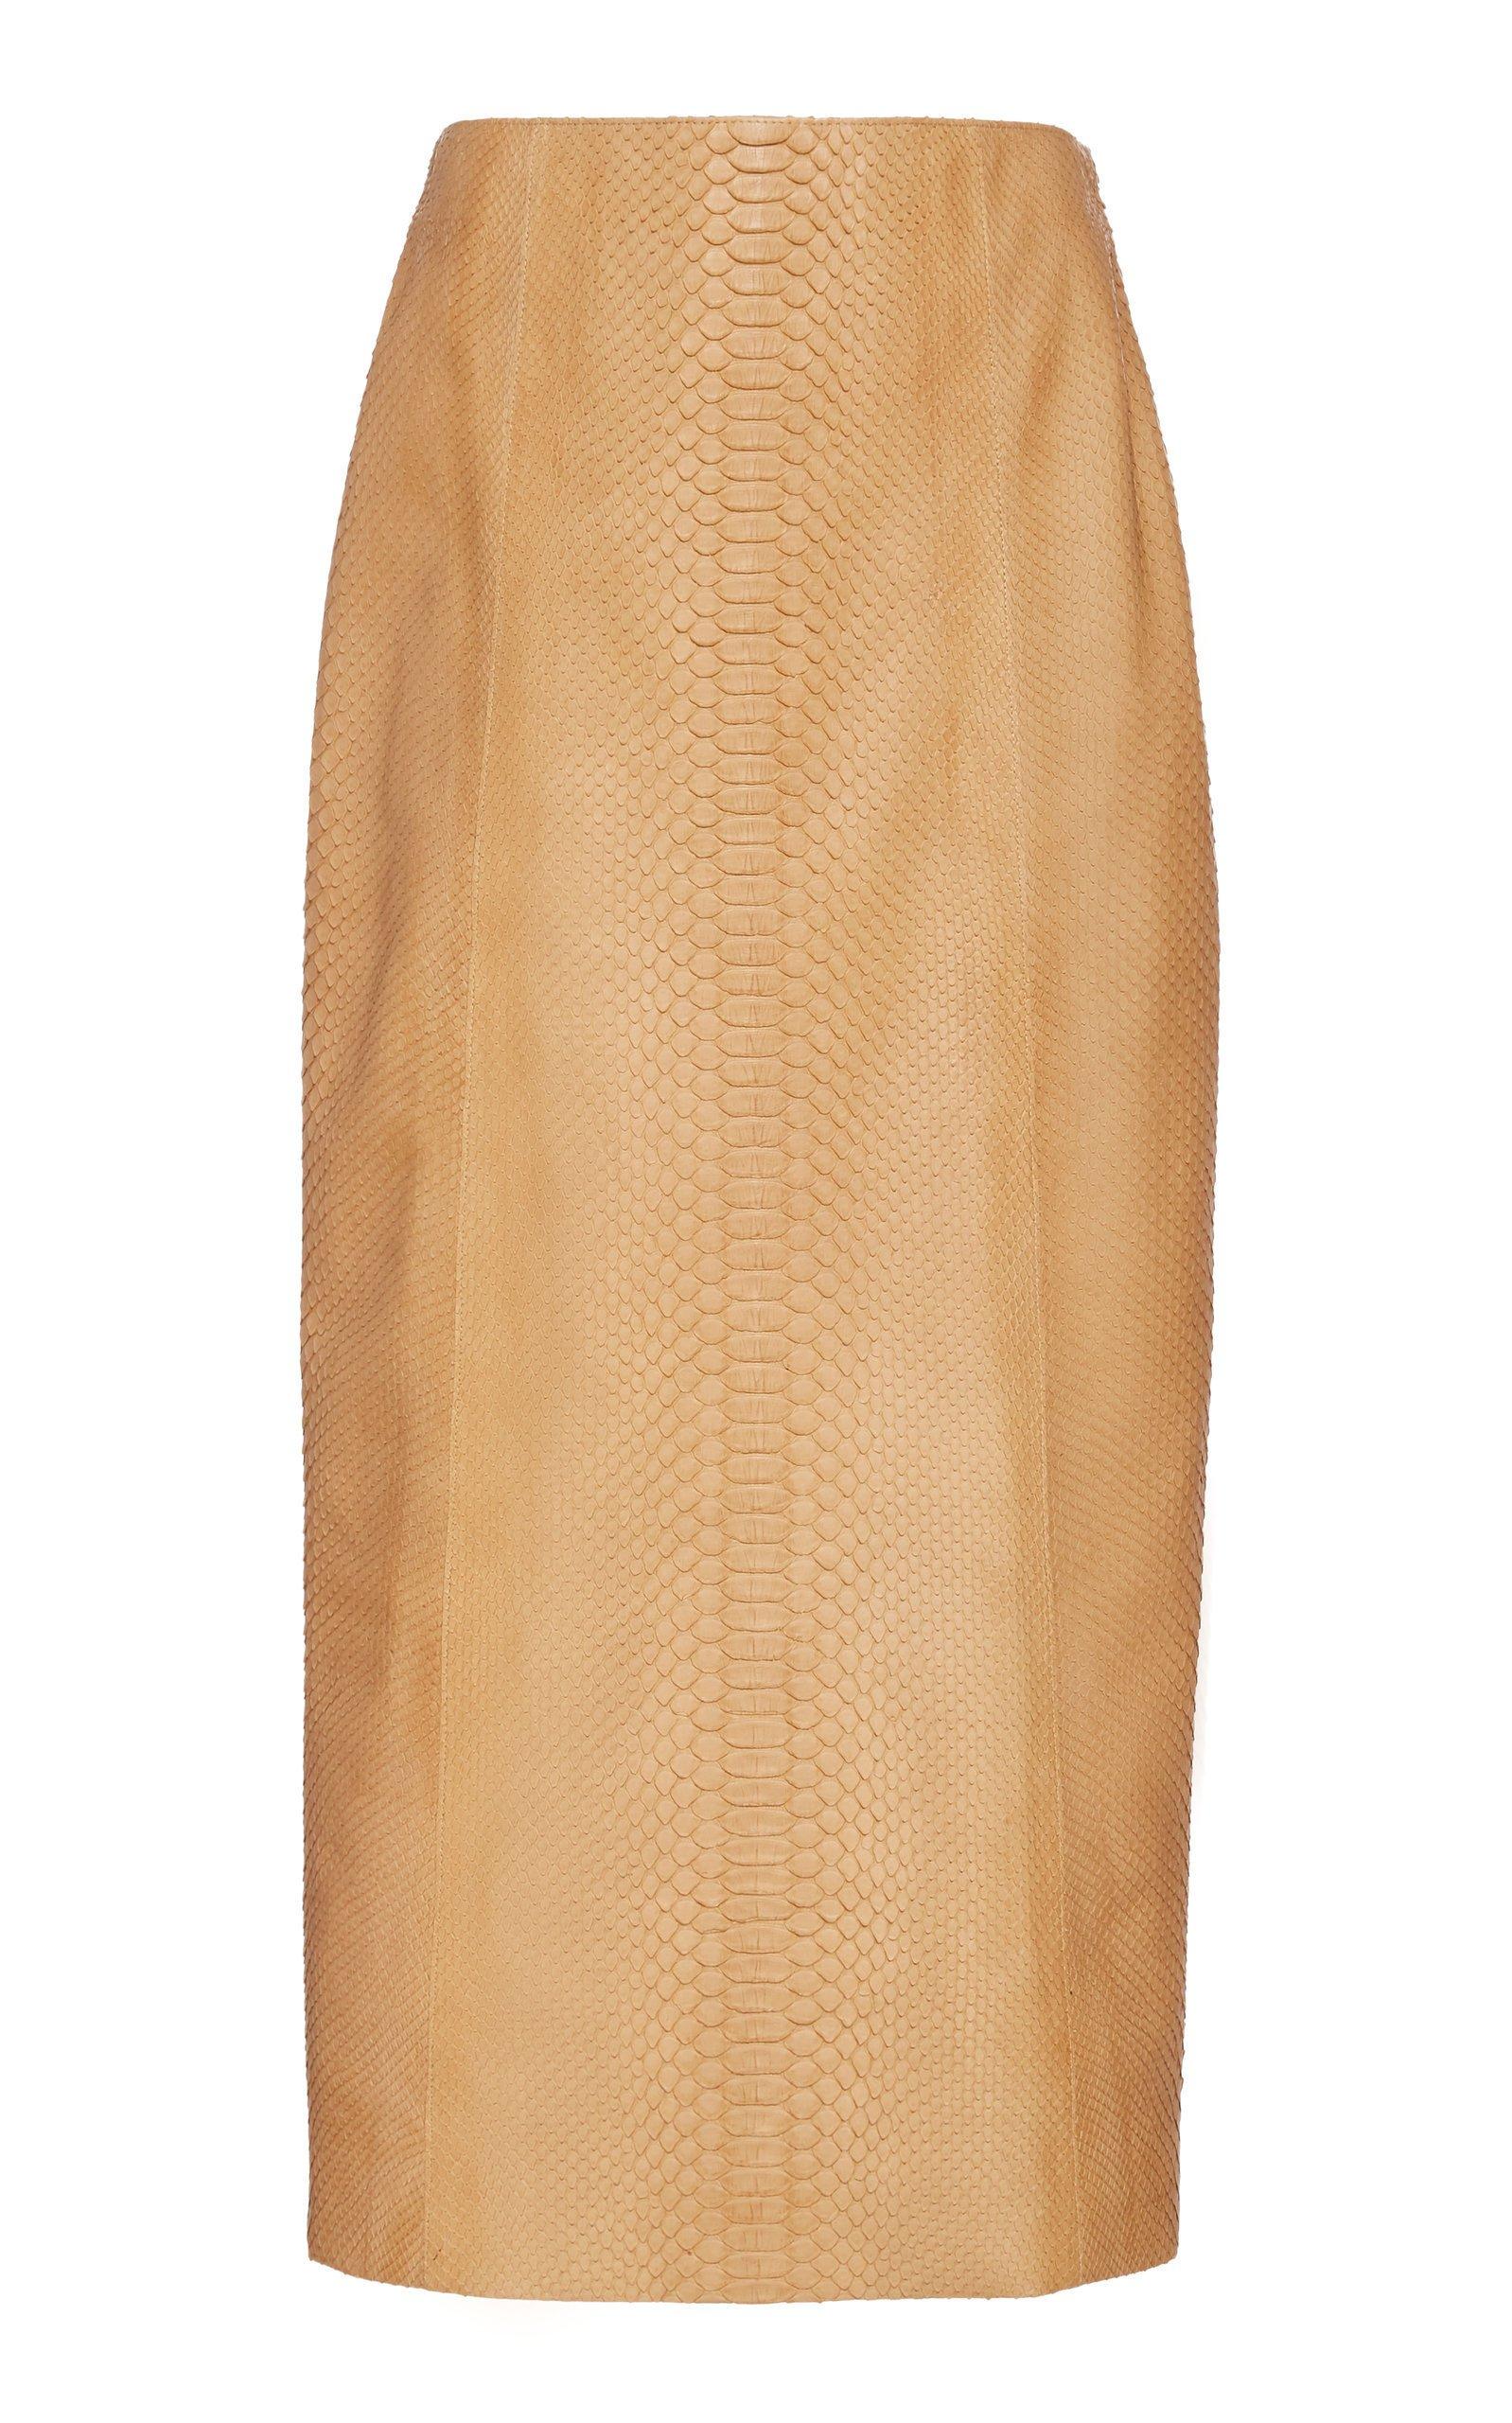 The Row Jenna Python Midi Skirt Size: 4